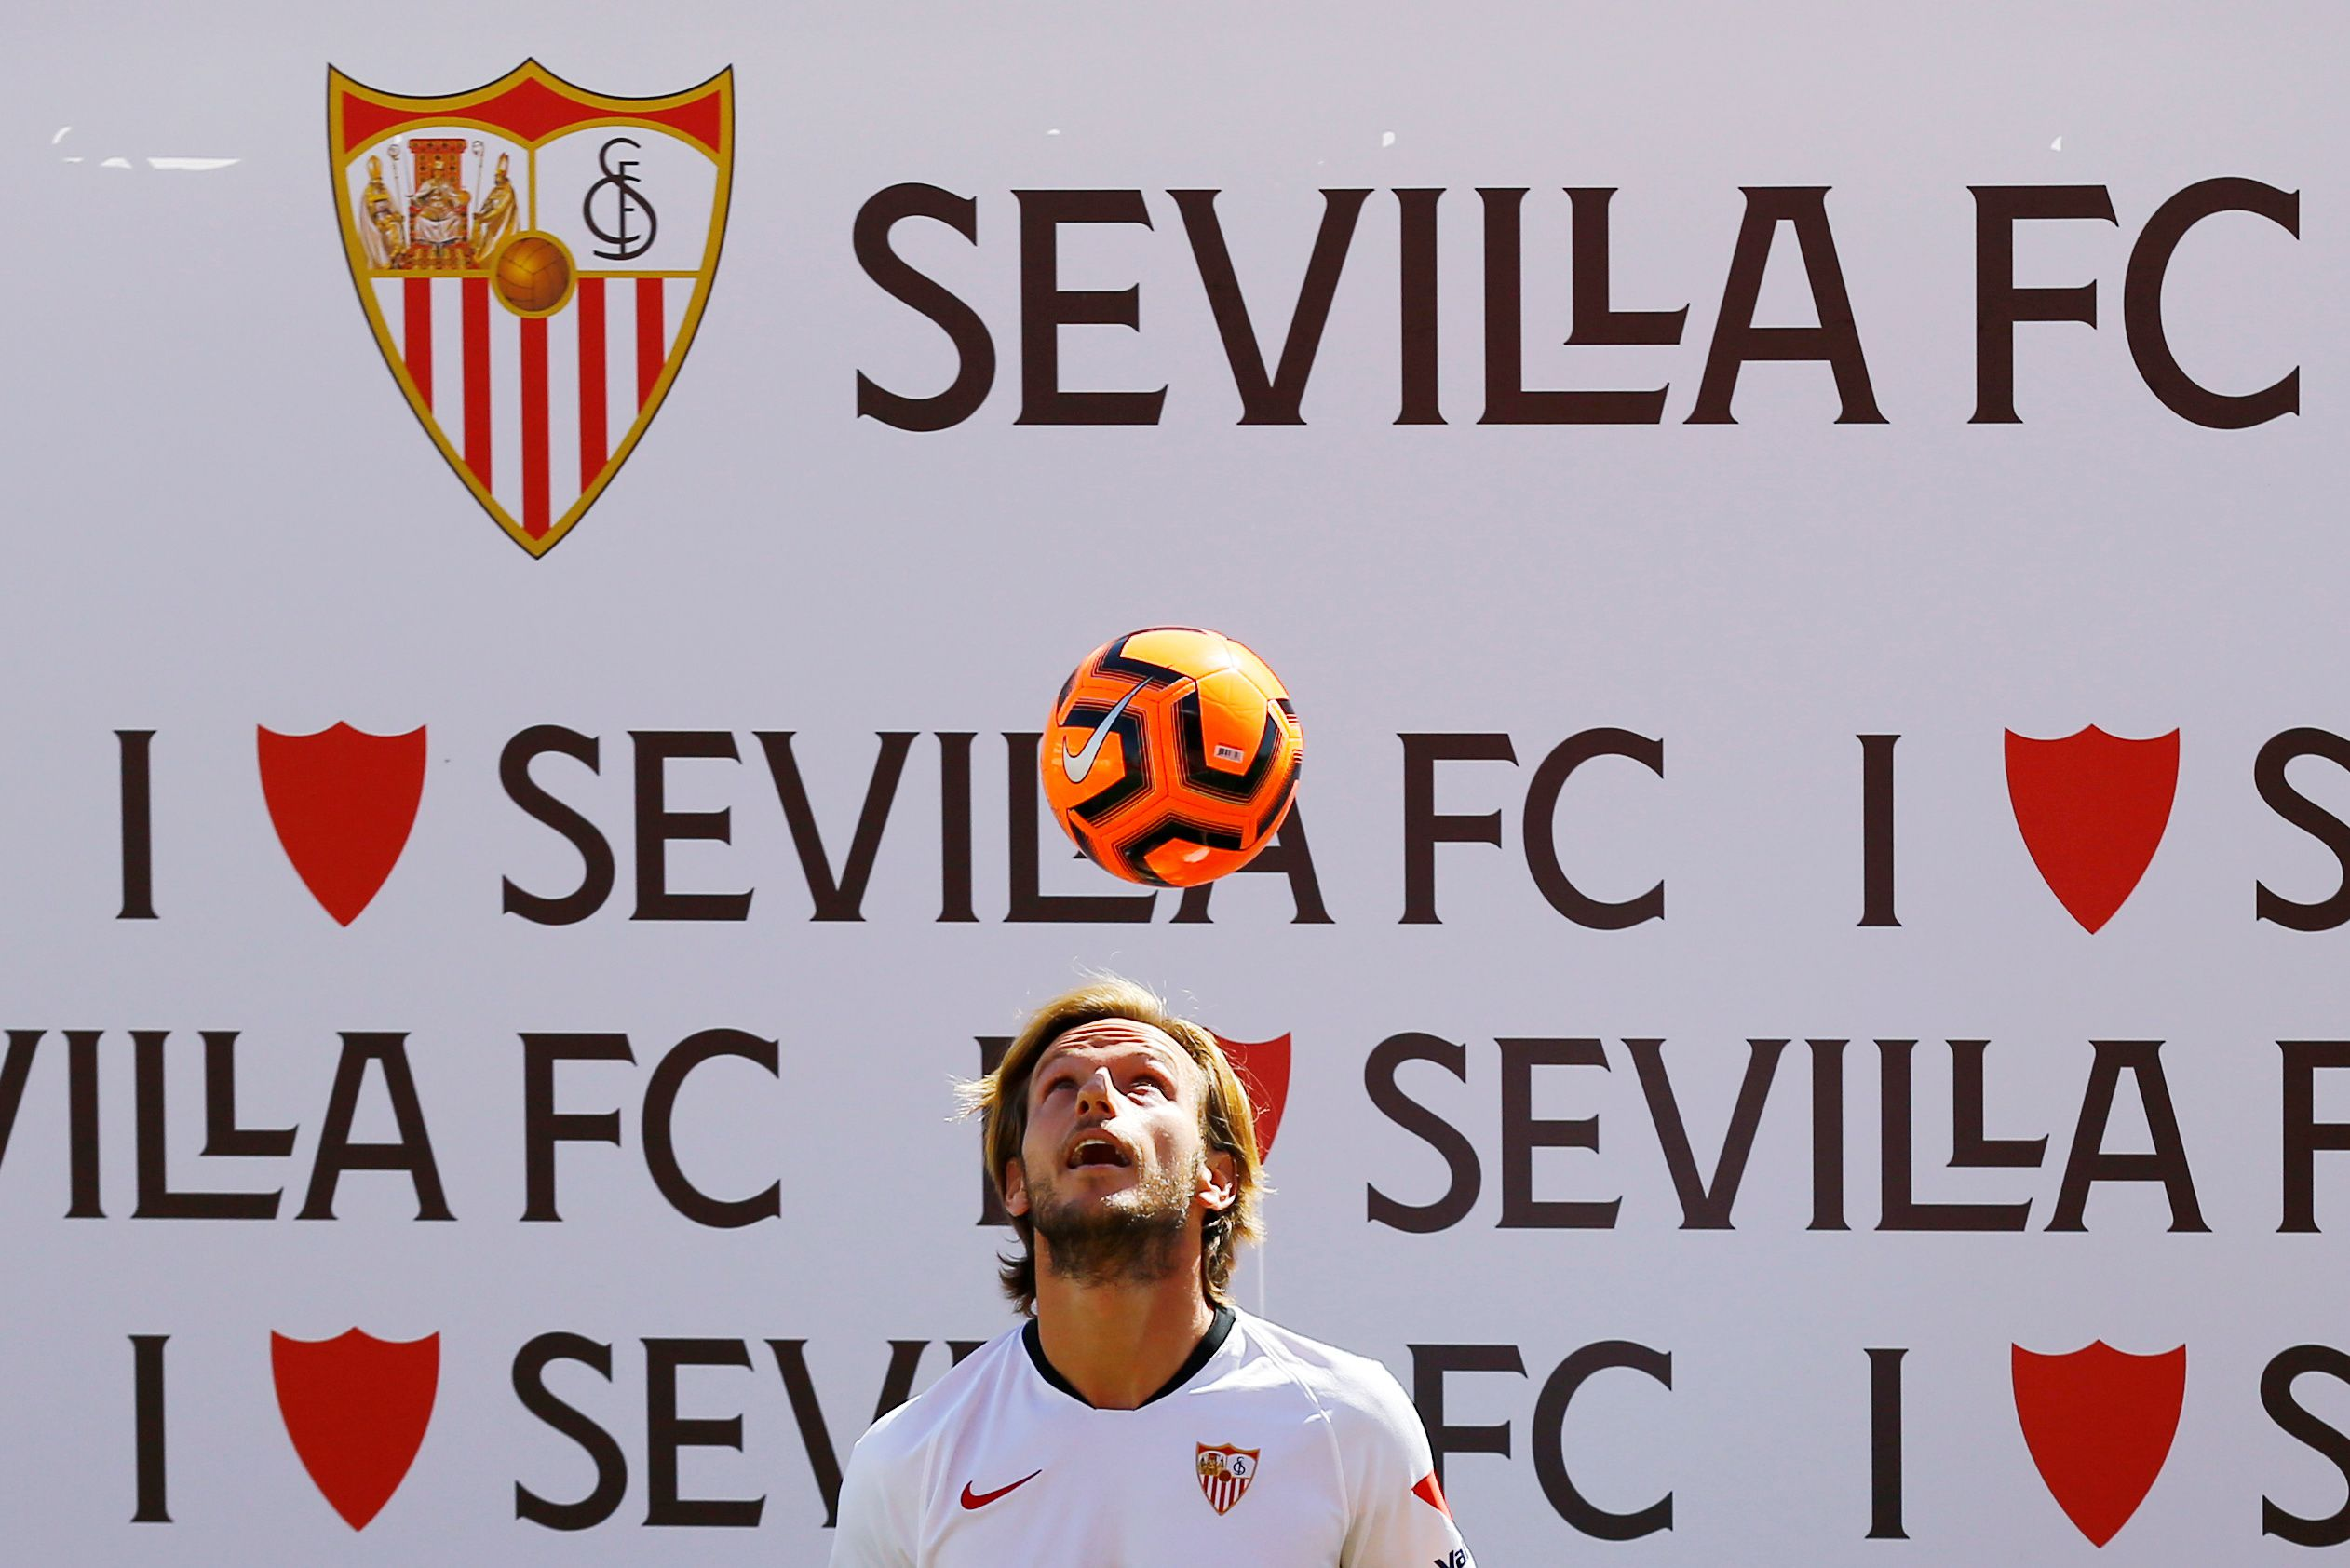 El mediocampista de 32 años volvió a Sevilla (Foto: Reuters)